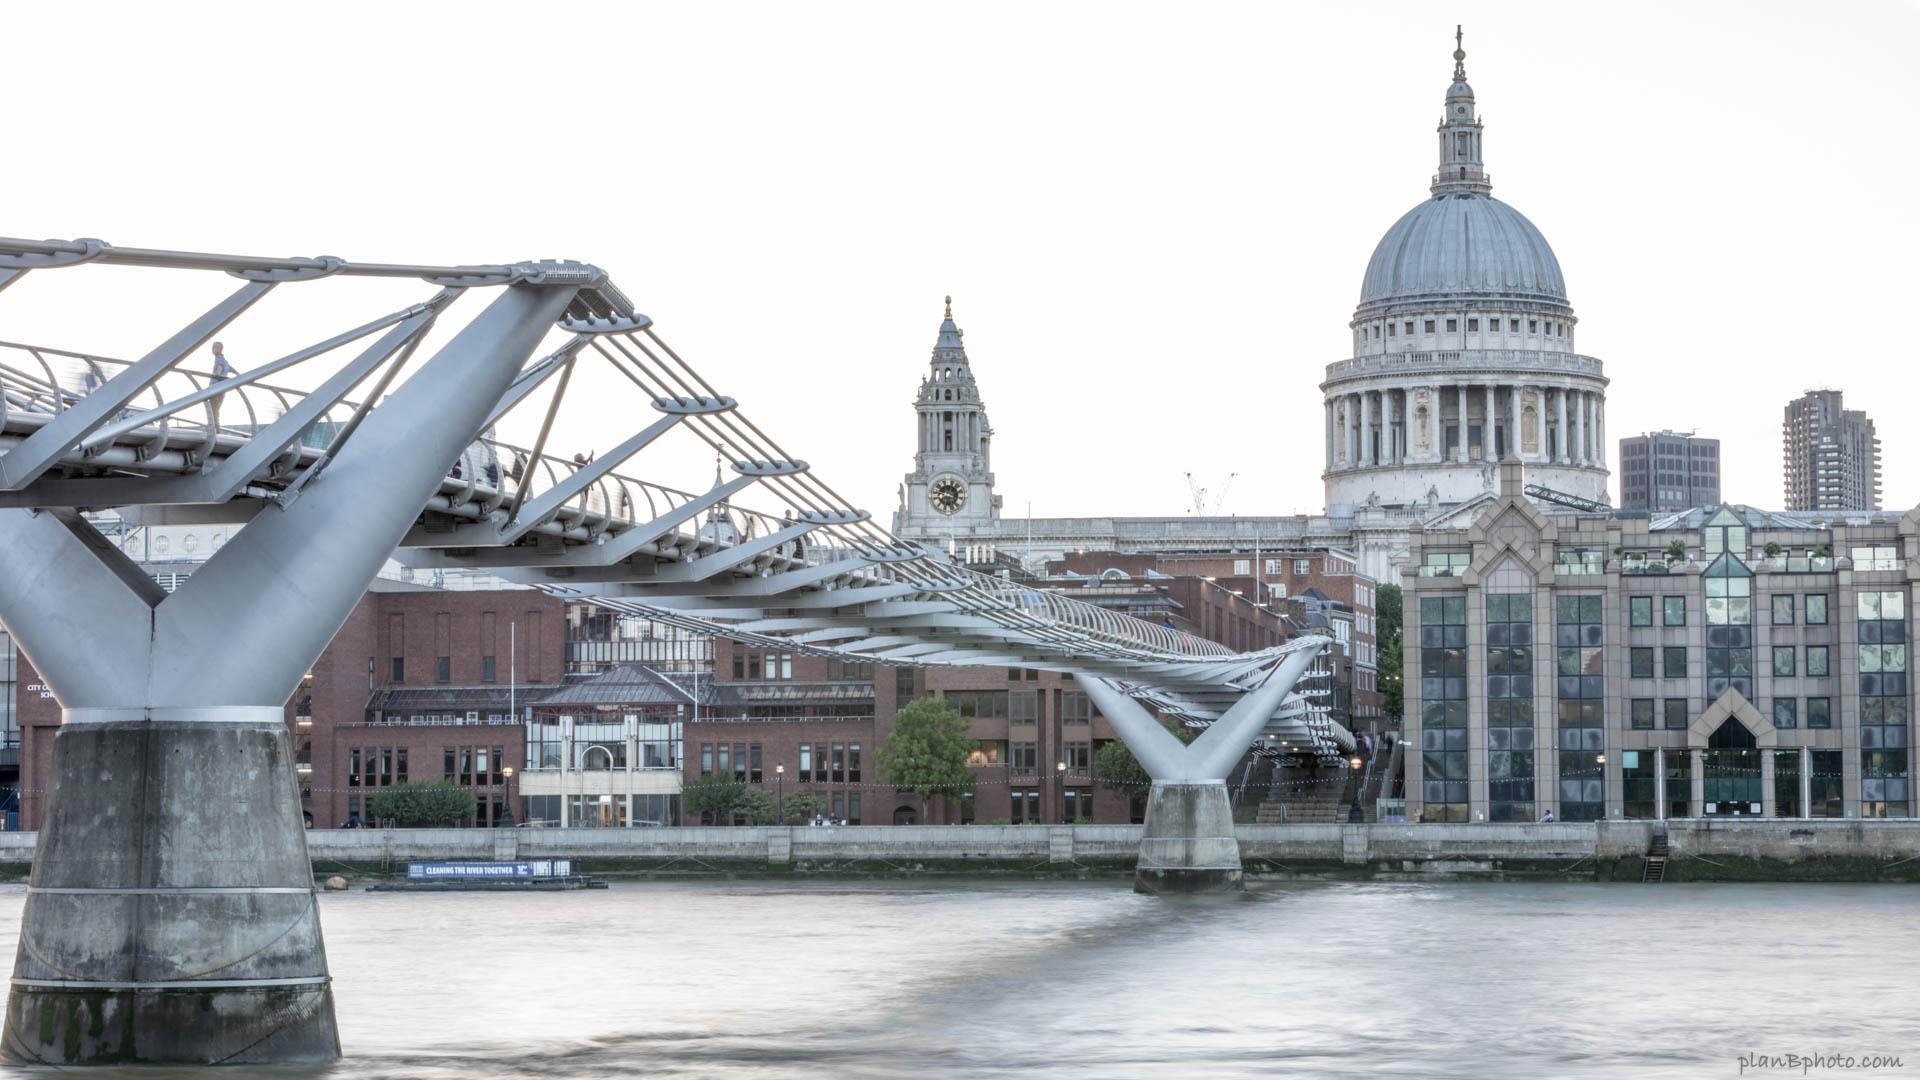 Millennium Bridge near St Pauls Cathedral in London